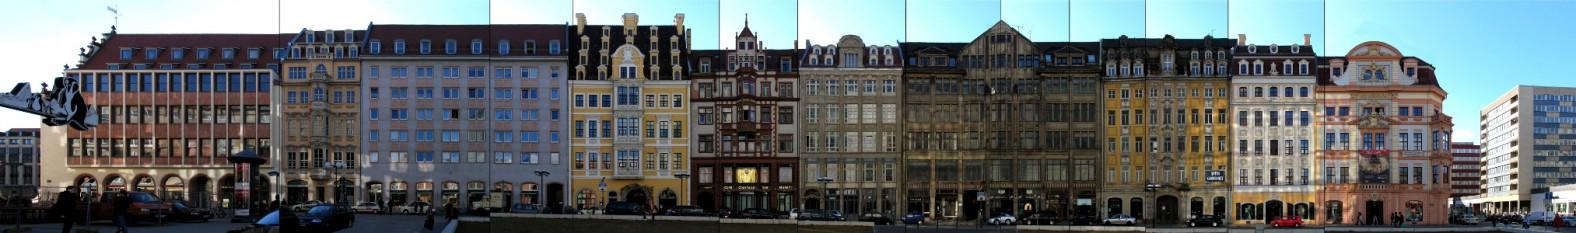 katharinenstrasse leipzig germany. Black Bedroom Furniture Sets. Home Design Ideas